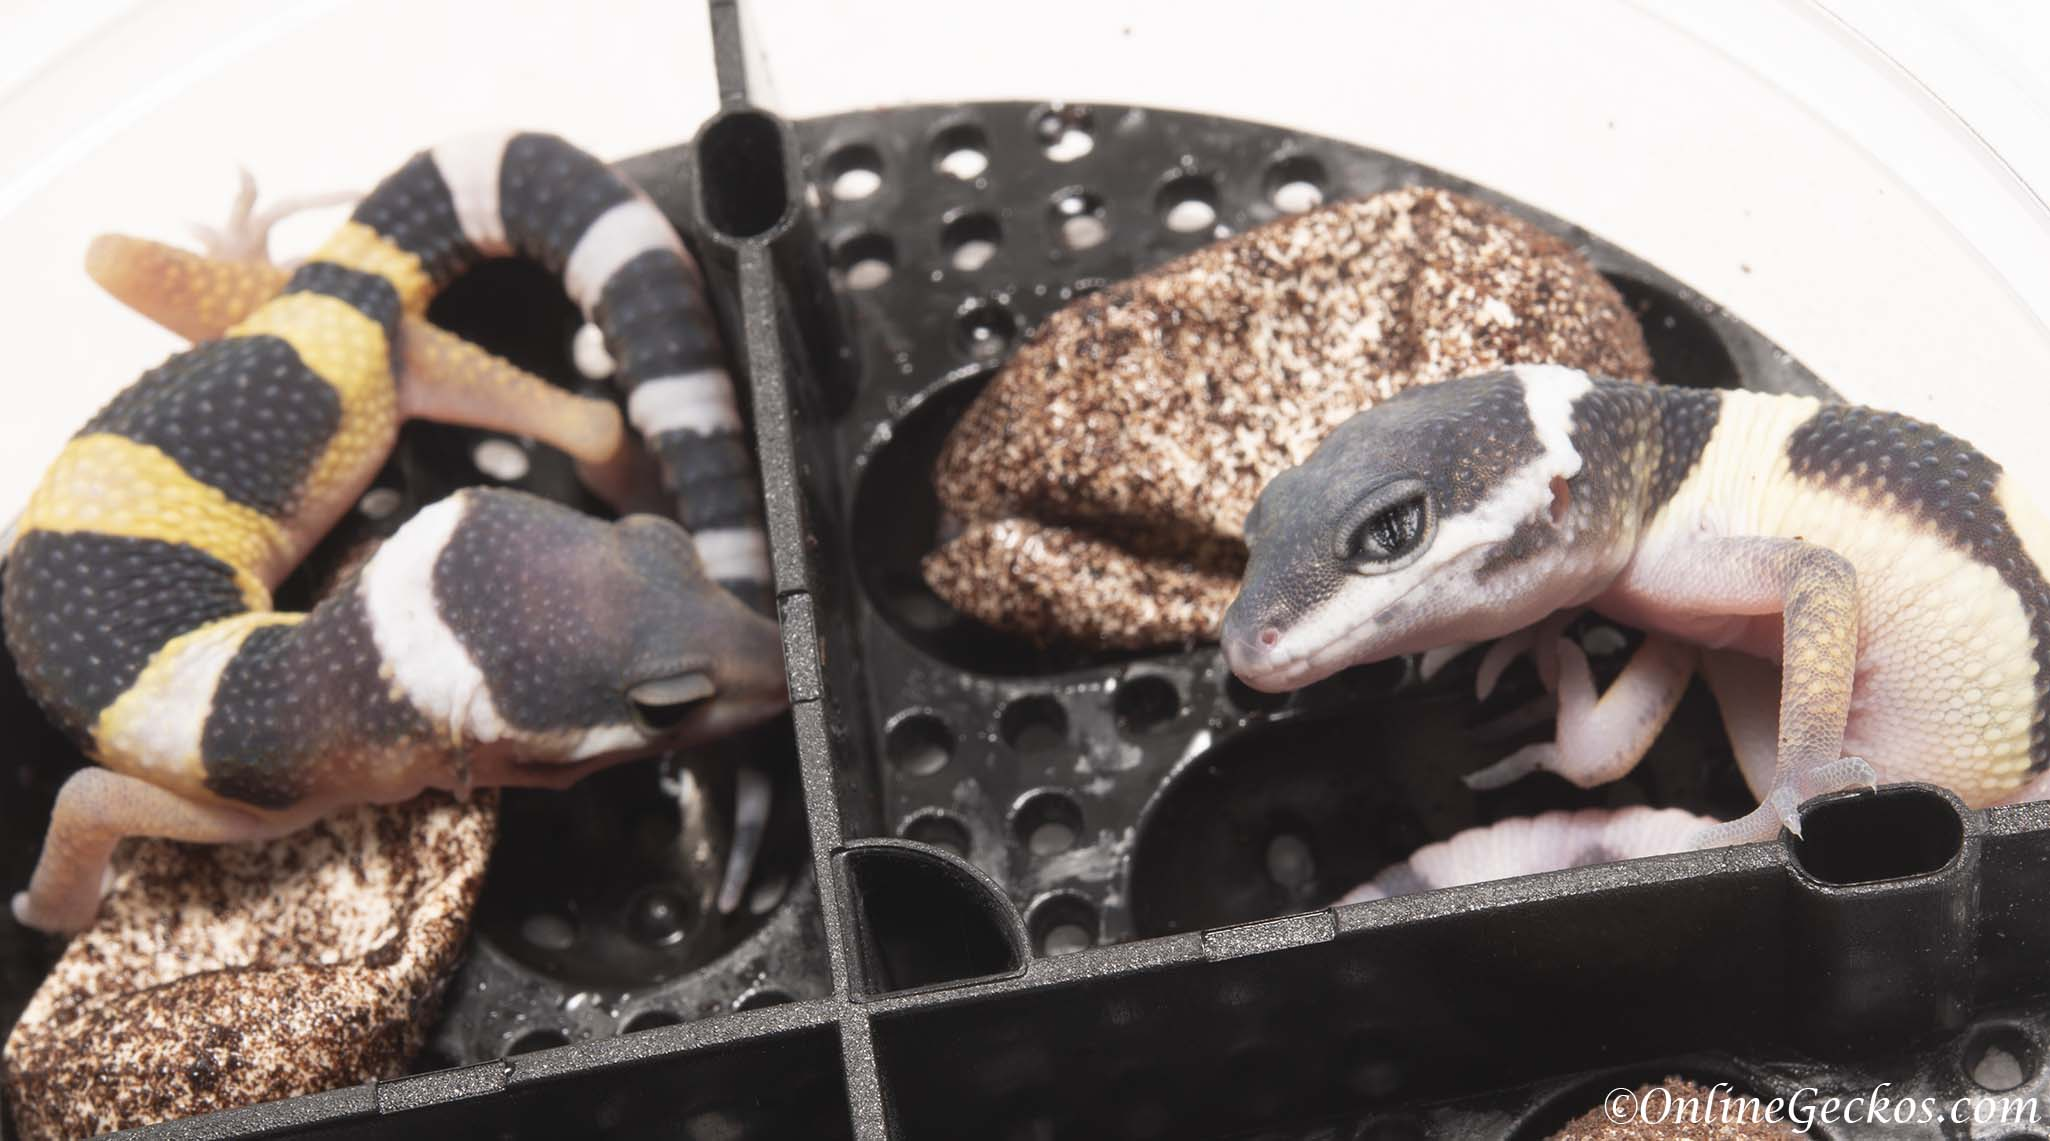 2018 Leopard Gecko Hatchling Update - OnlineGeckos.com ...Leopard Gecko Hatchling